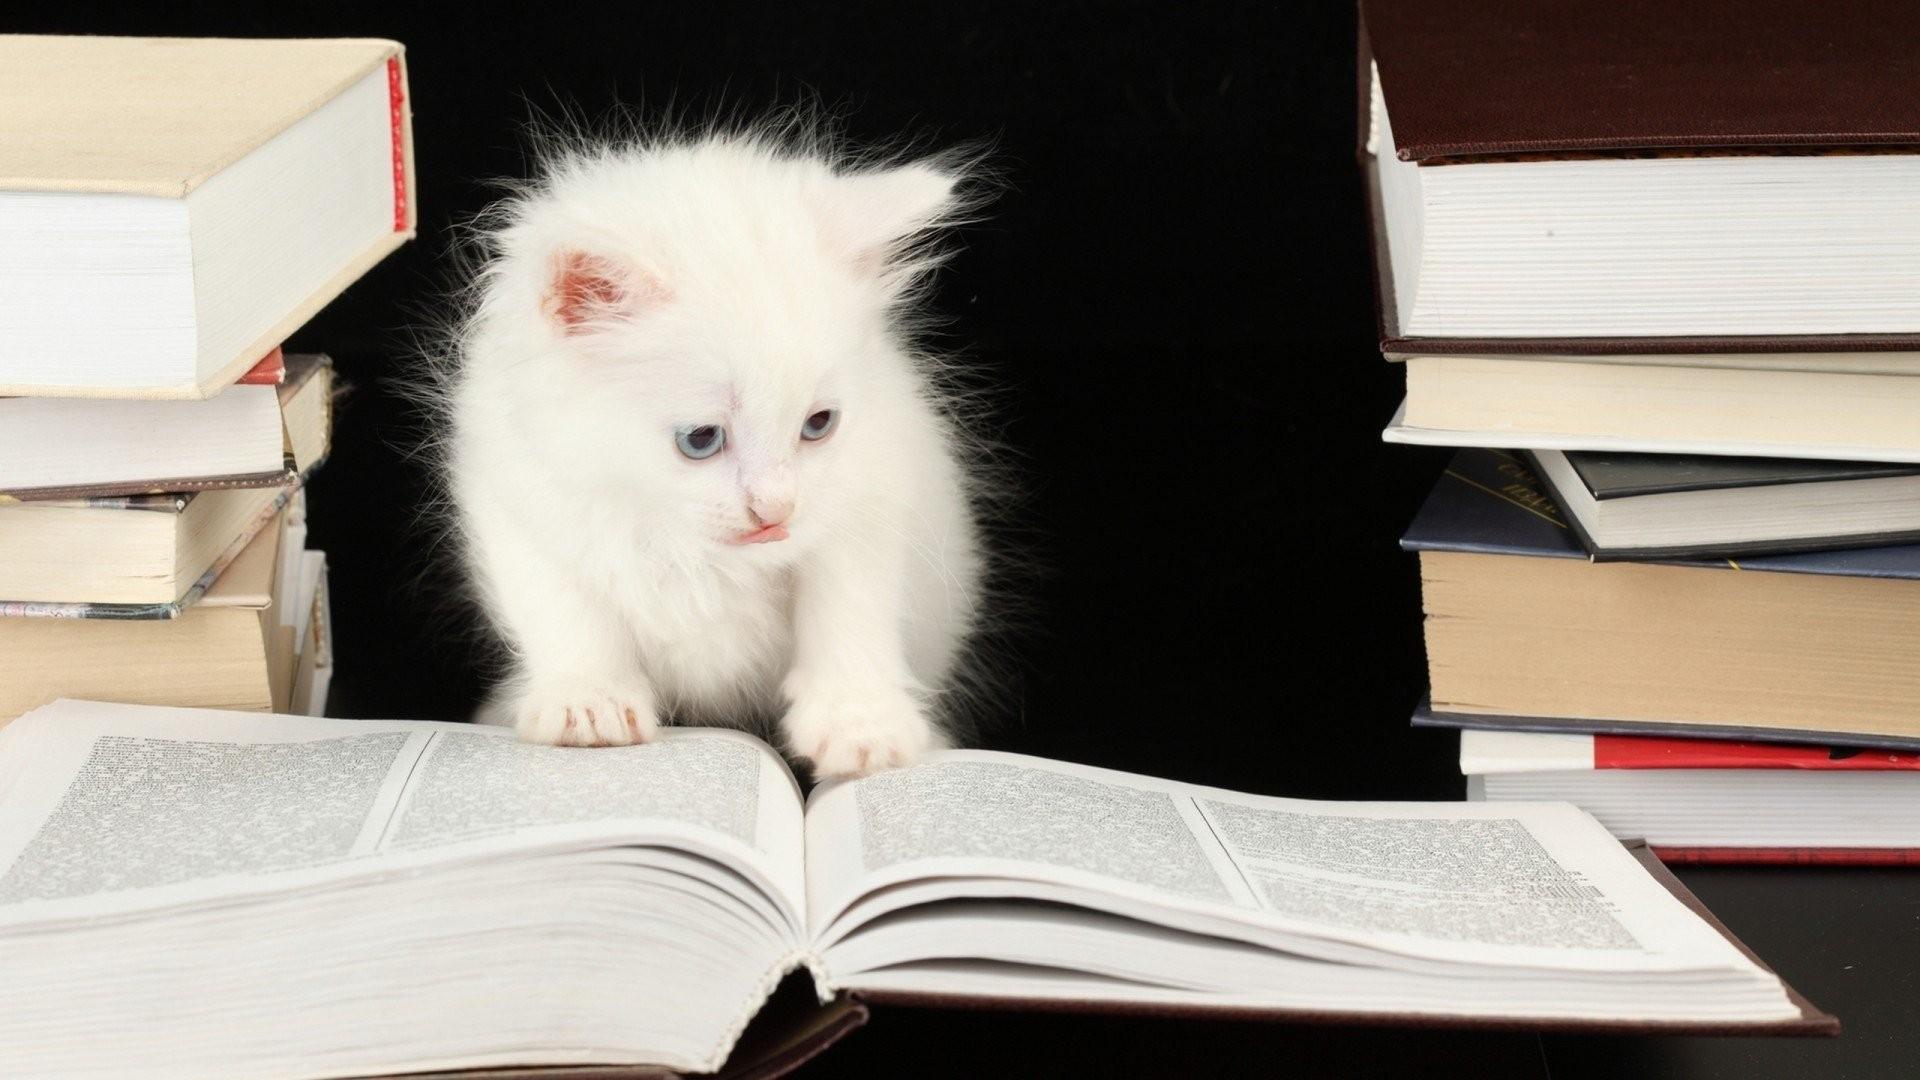 kittens wallpaper ·① download free stunning full hd wallpapers